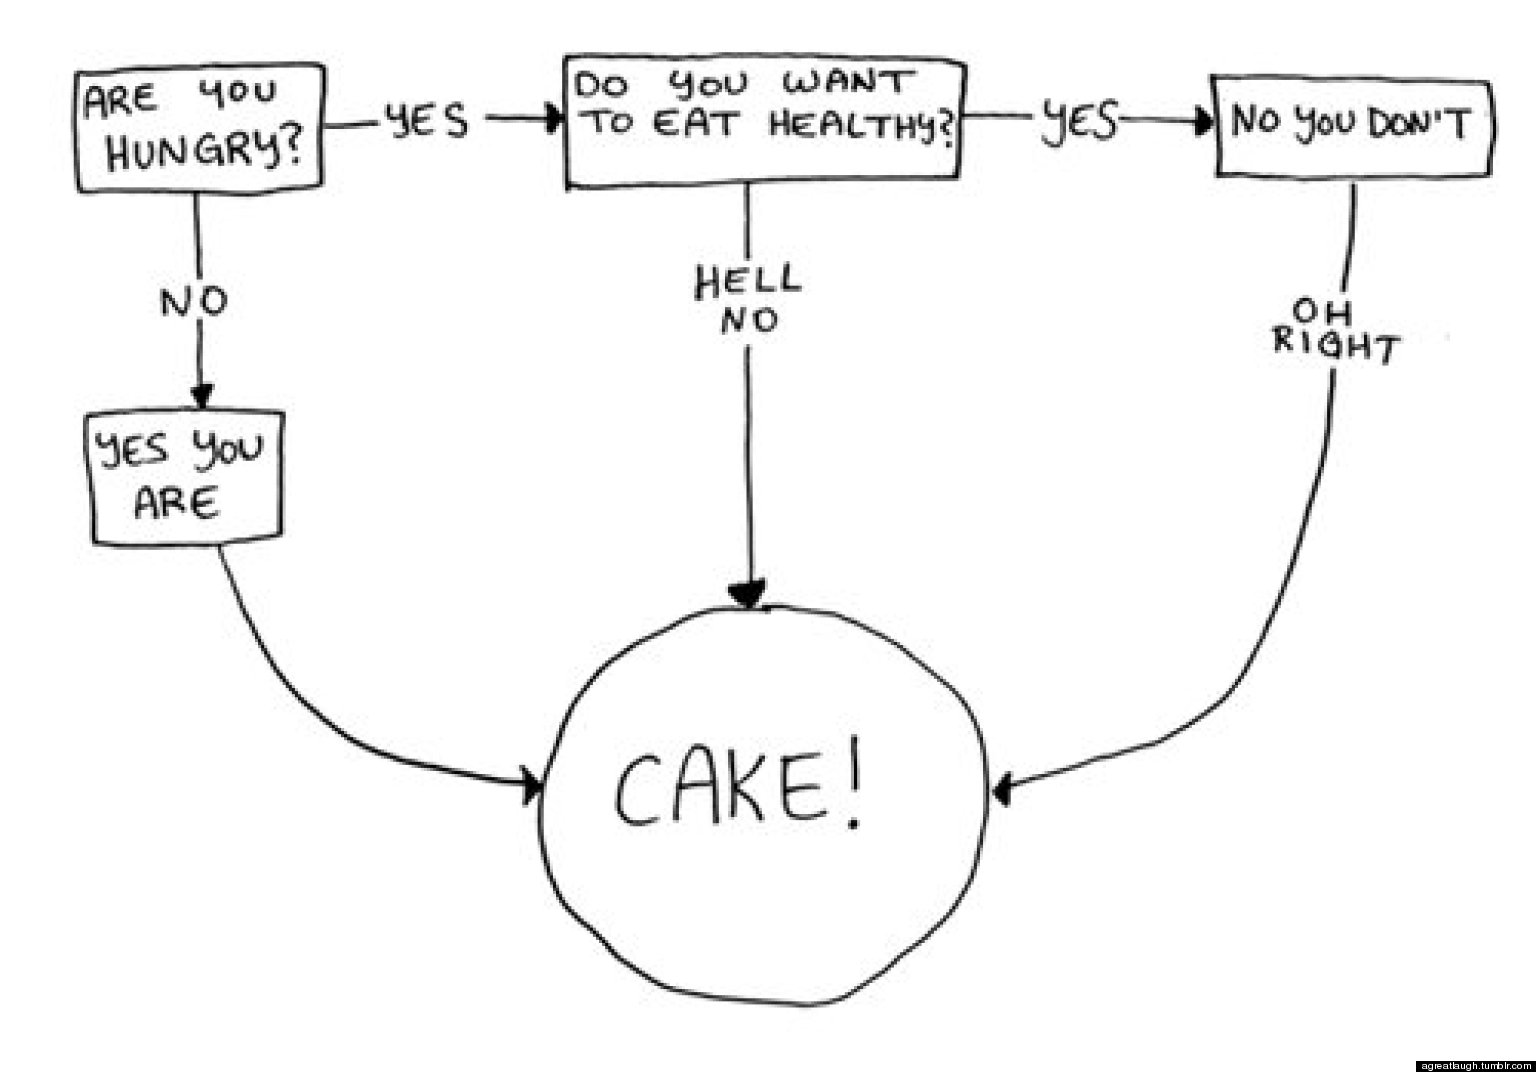 Do you want cake flowchart huffpost flowchart huffpost nvjuhfo Images